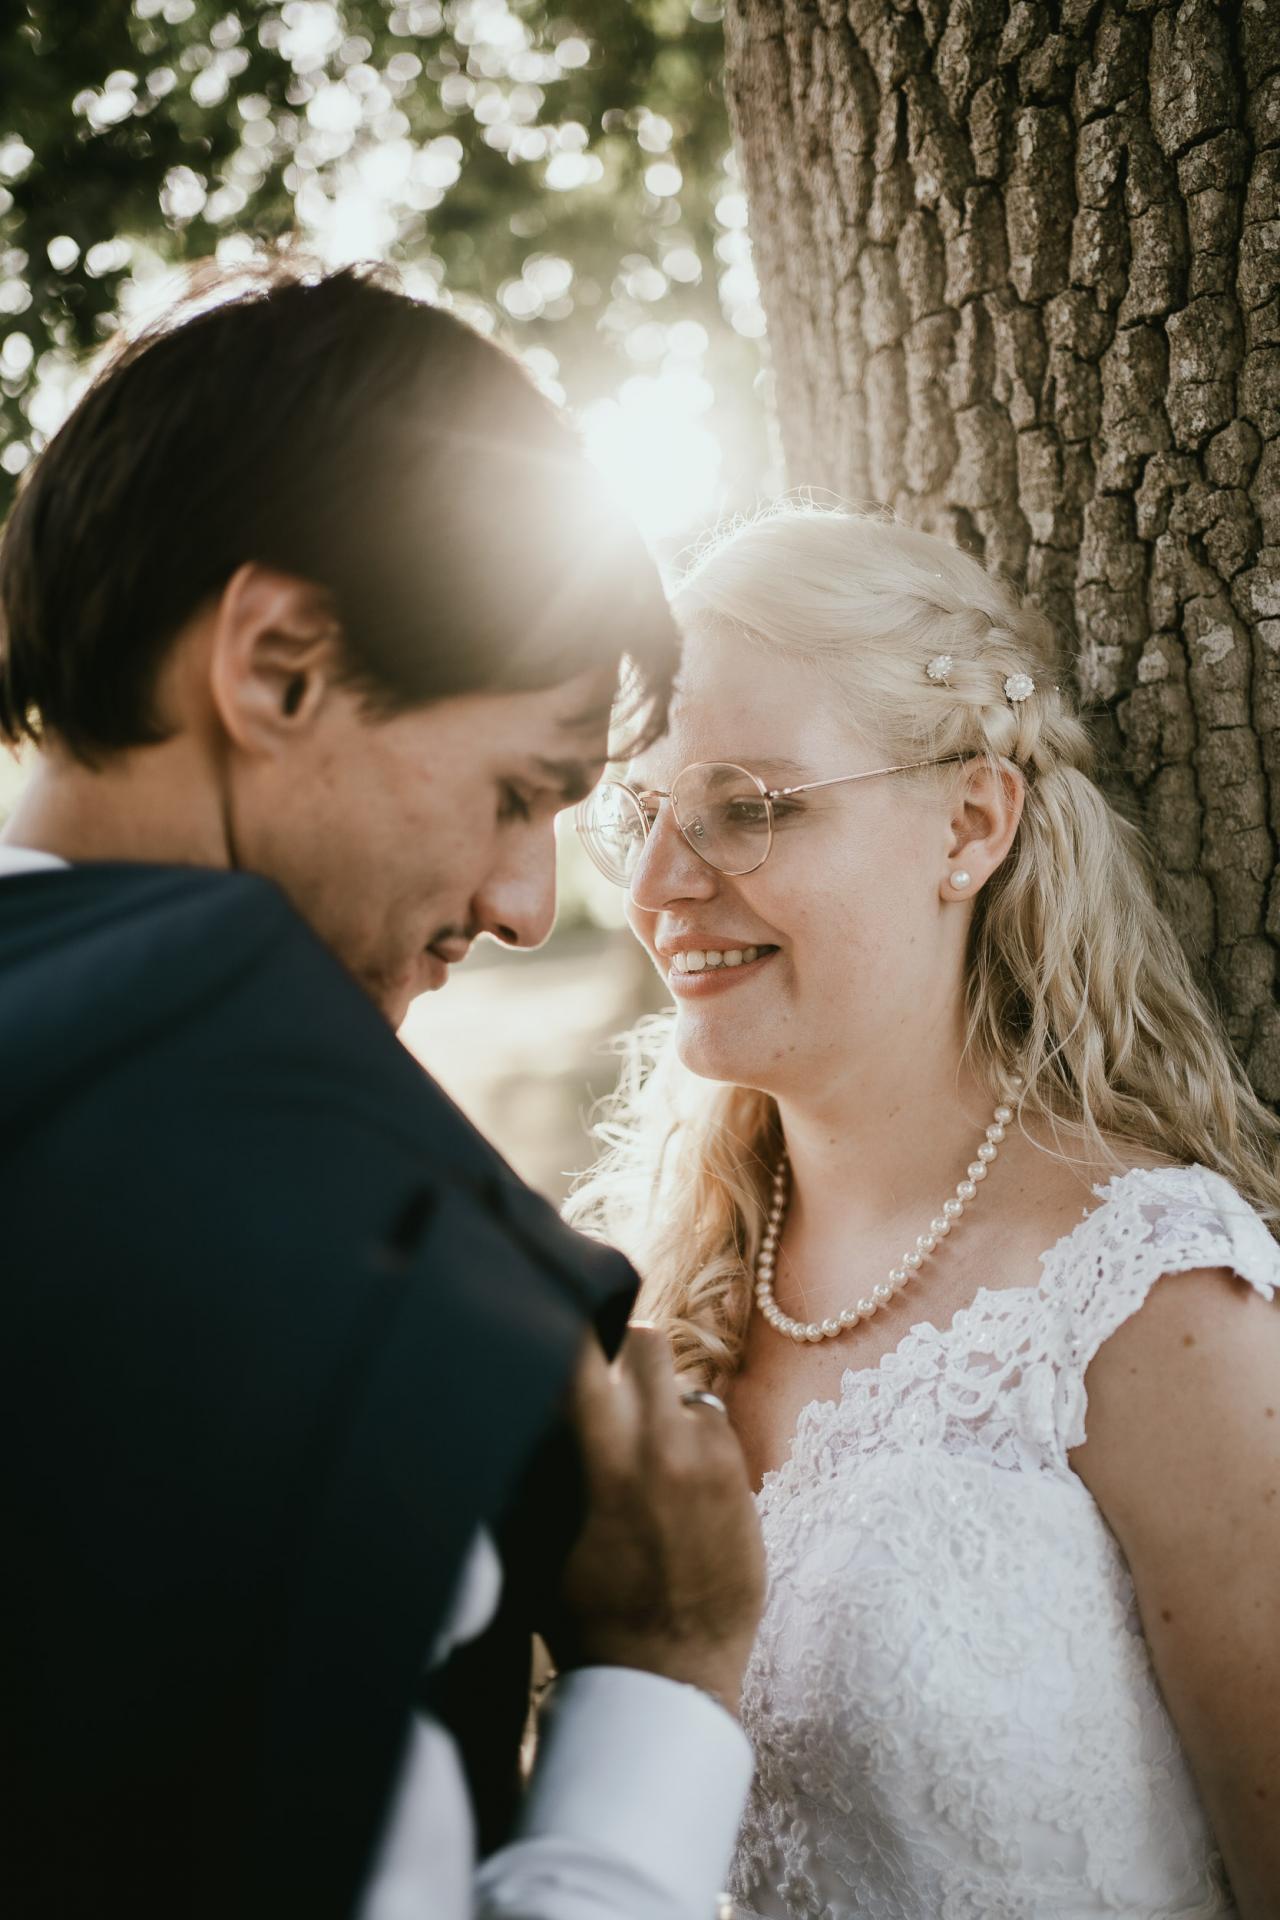 Photographe de mariage moody boho chic boheme dax landes aquitaine fineart 11